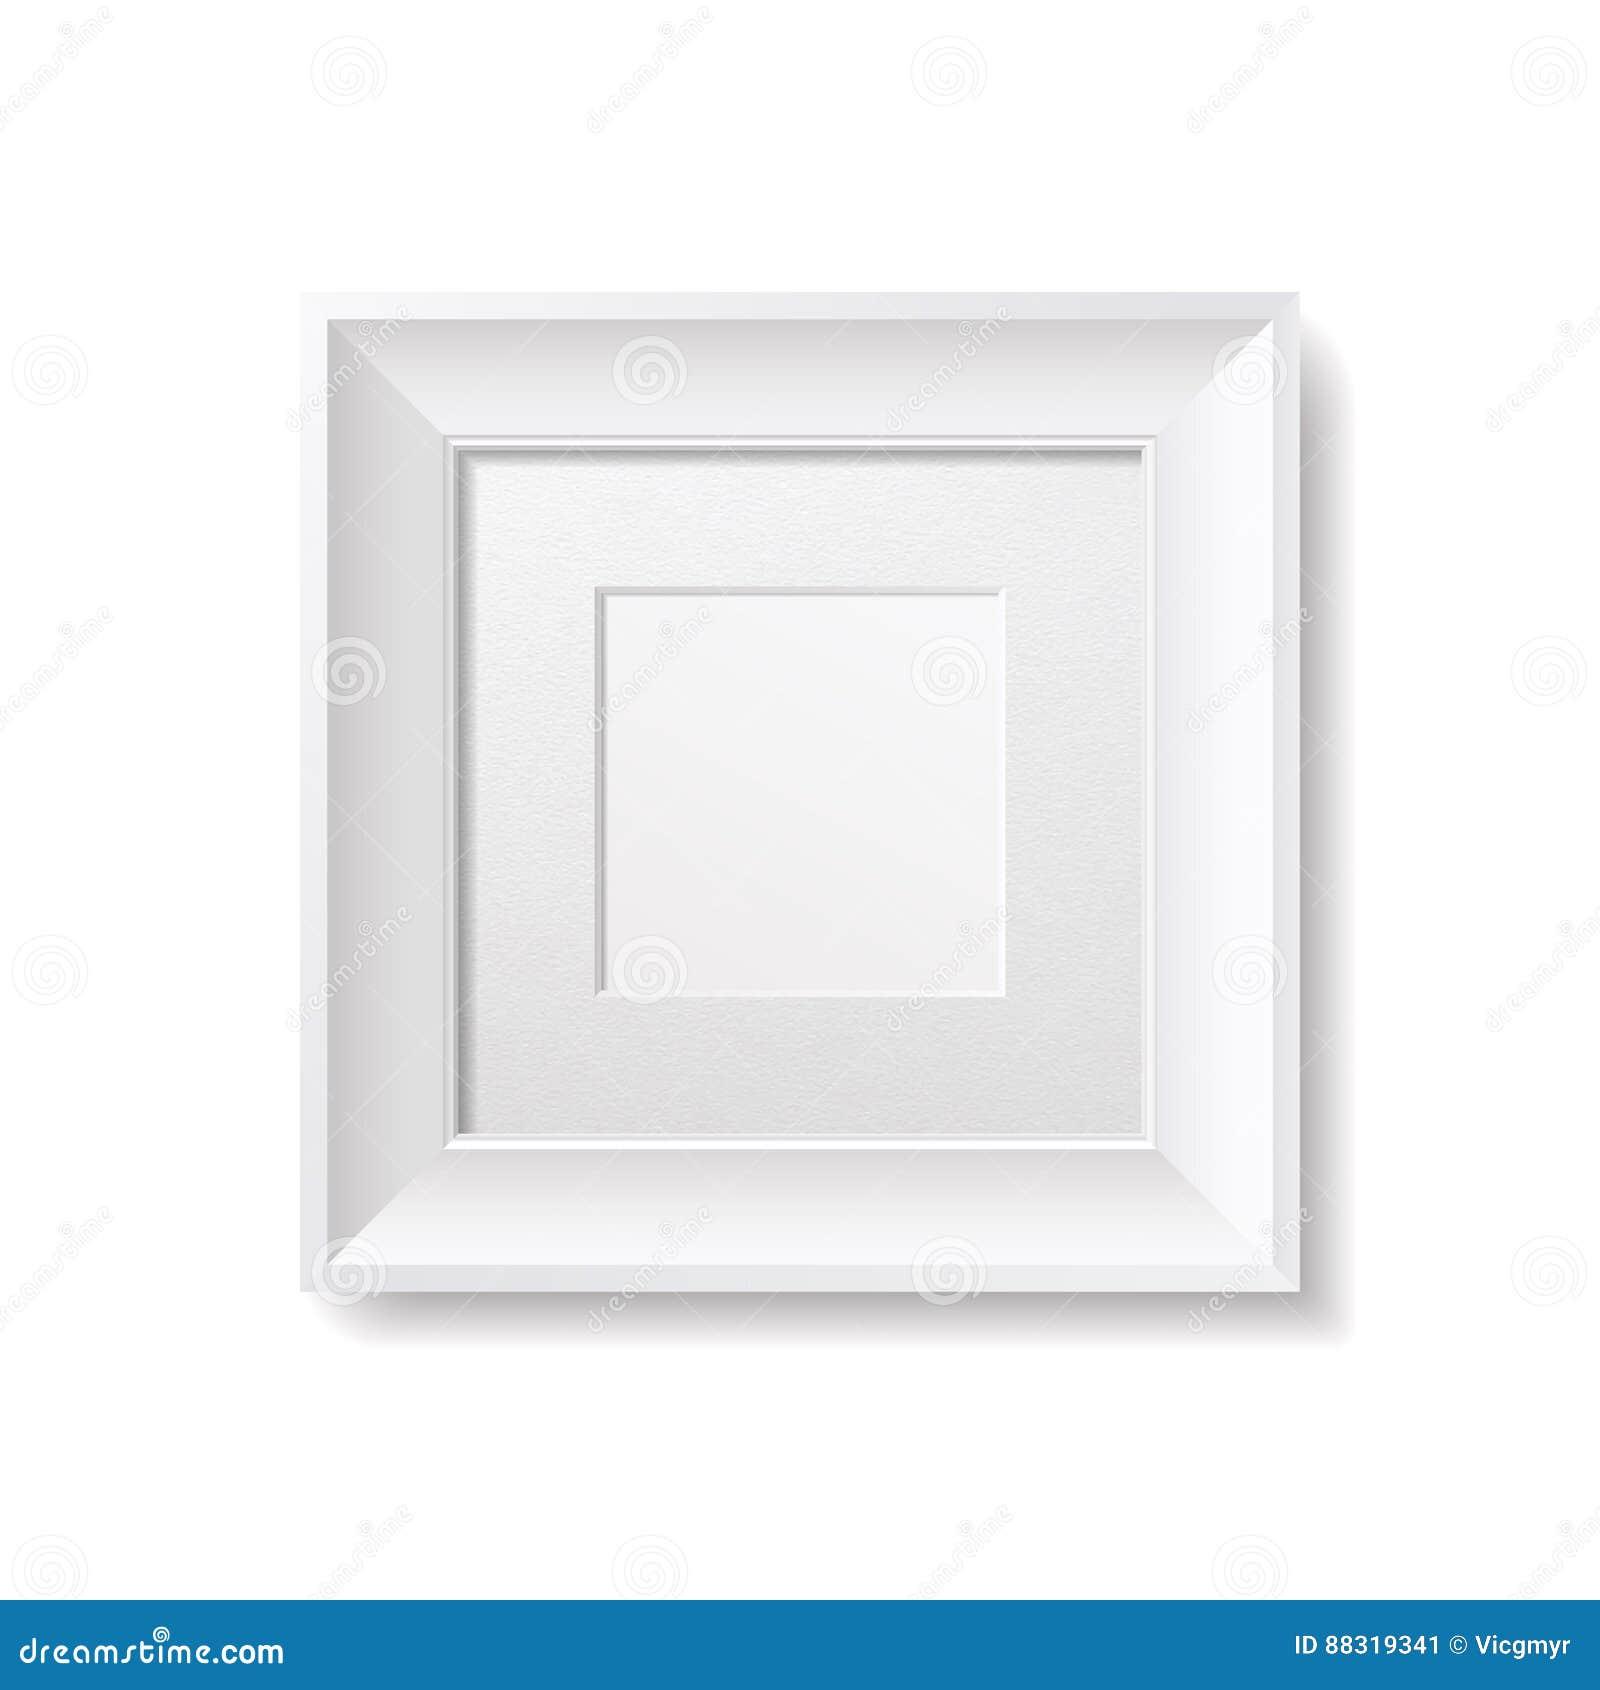 Weißes Quadrat-Rahmen Mit Pappe Passepartout Vektor Abbildung ...